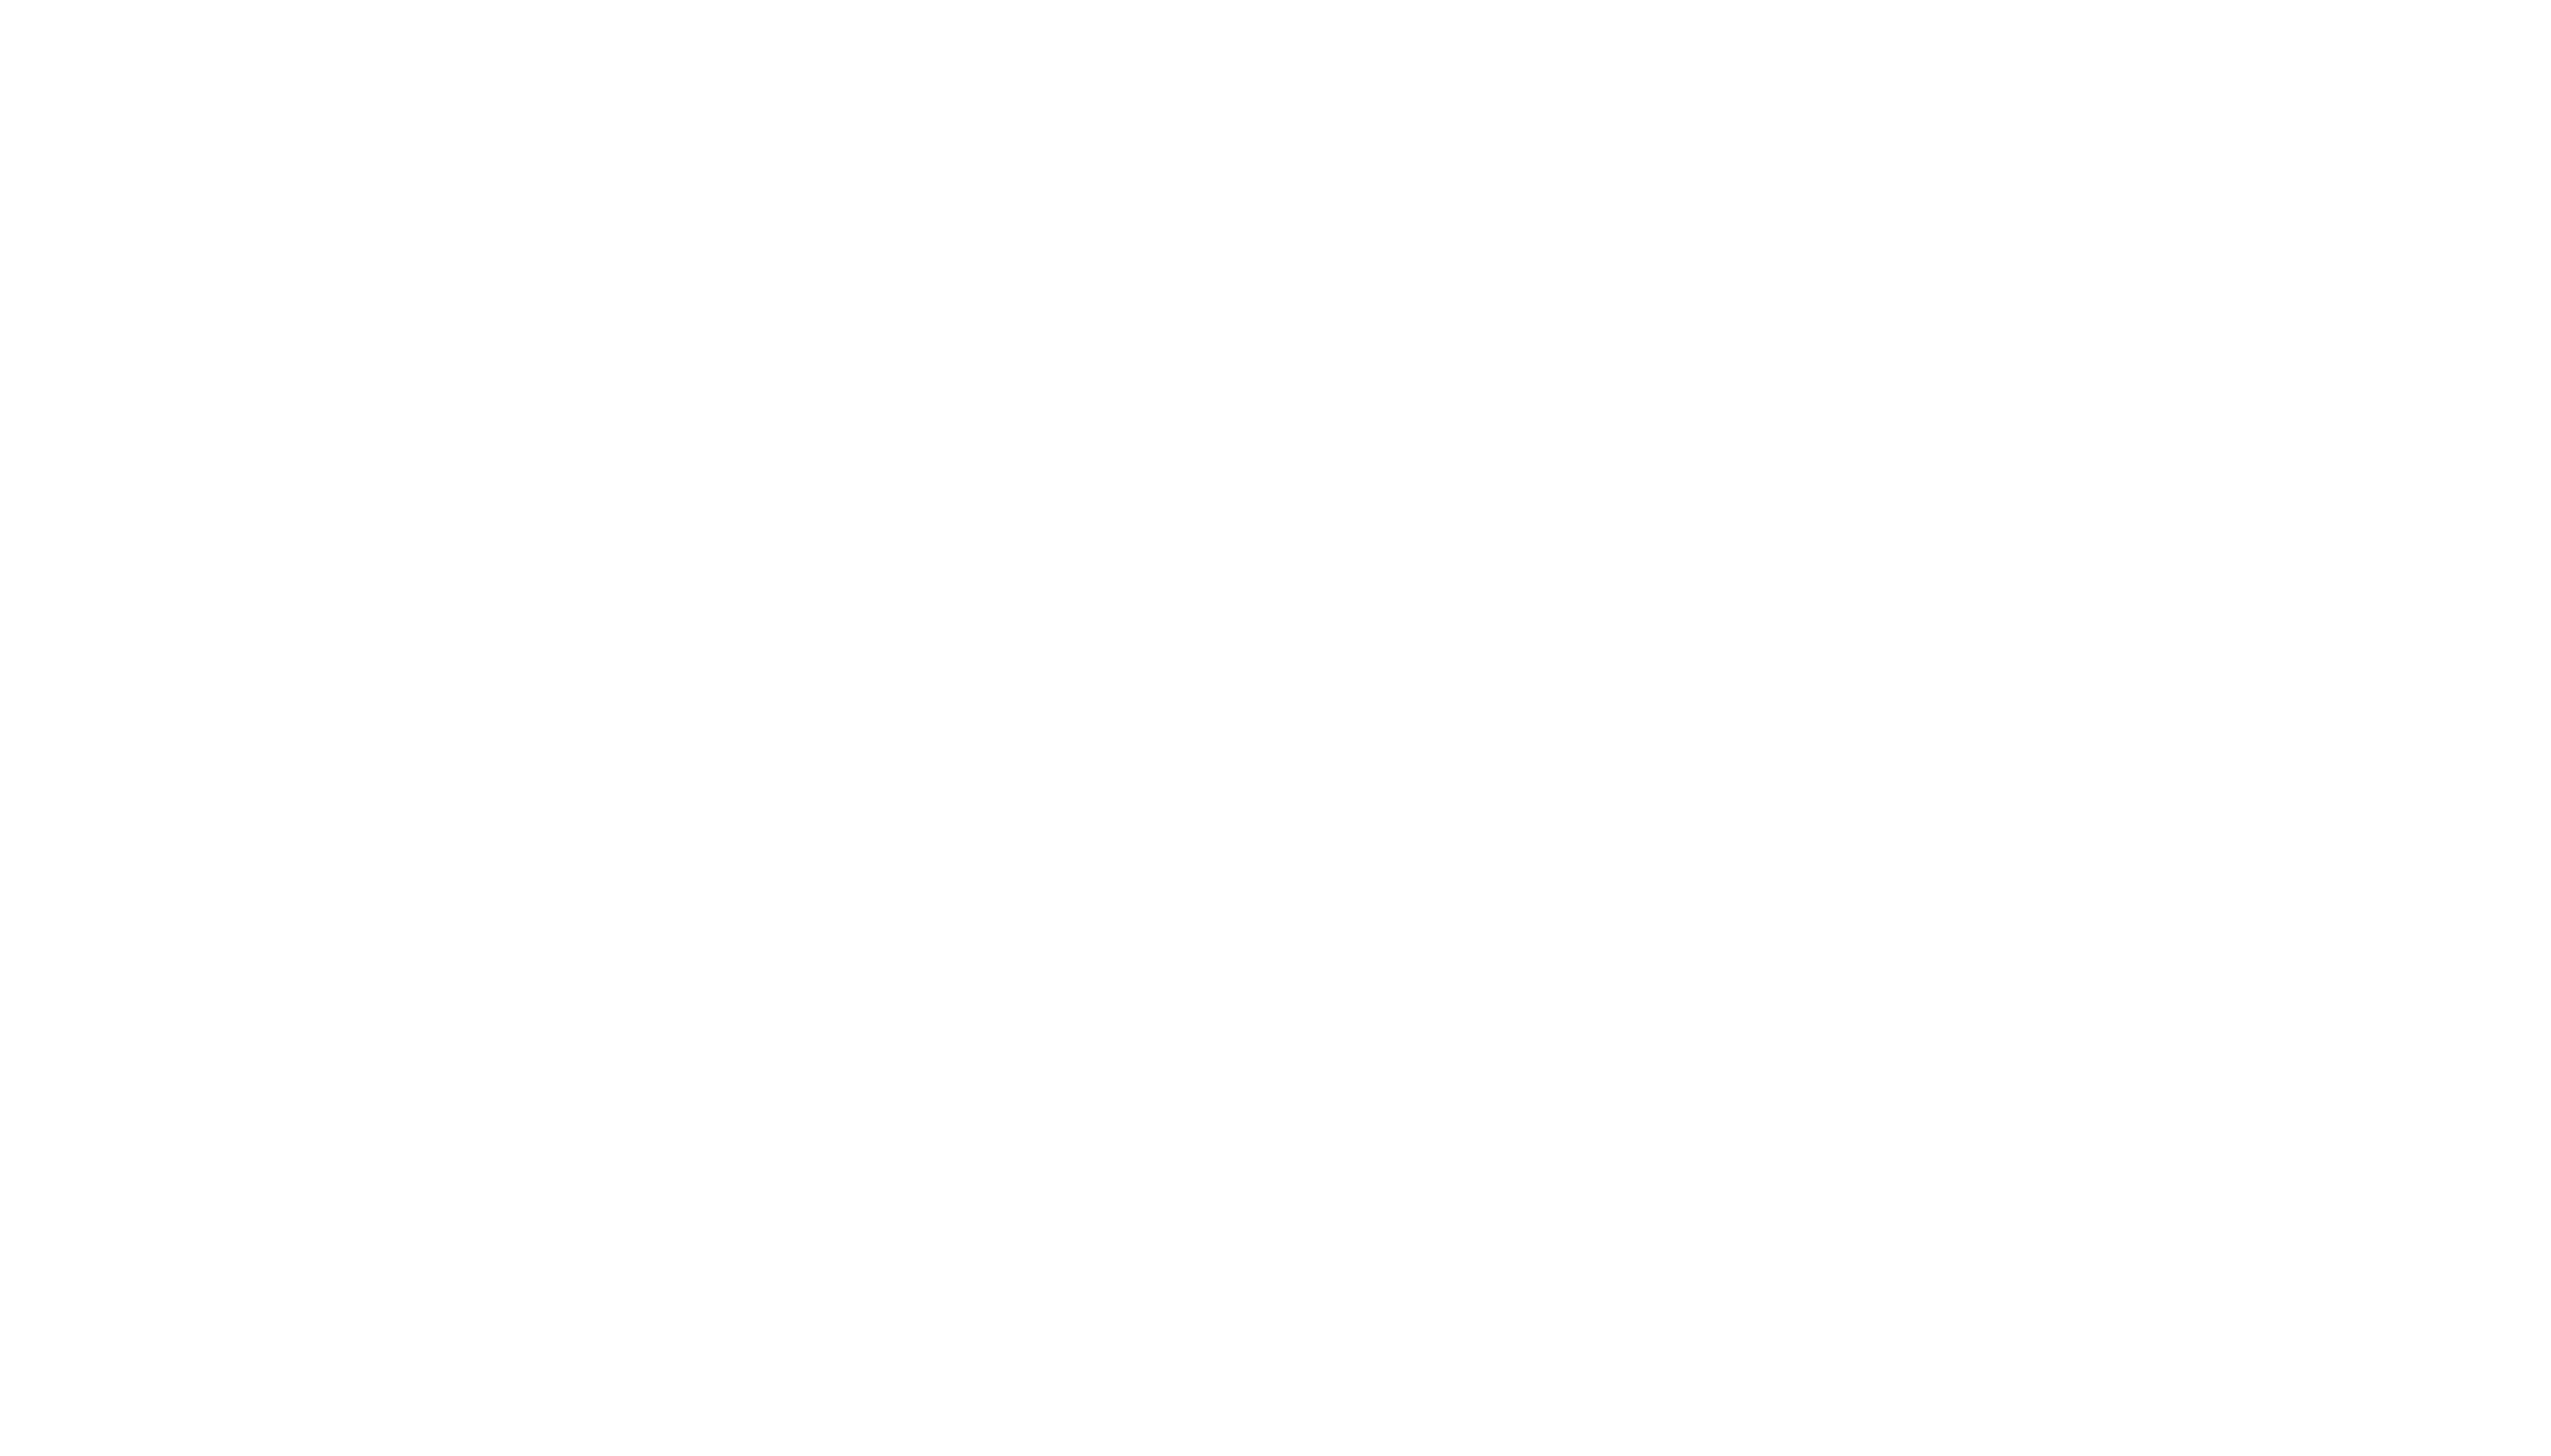 pattern-white